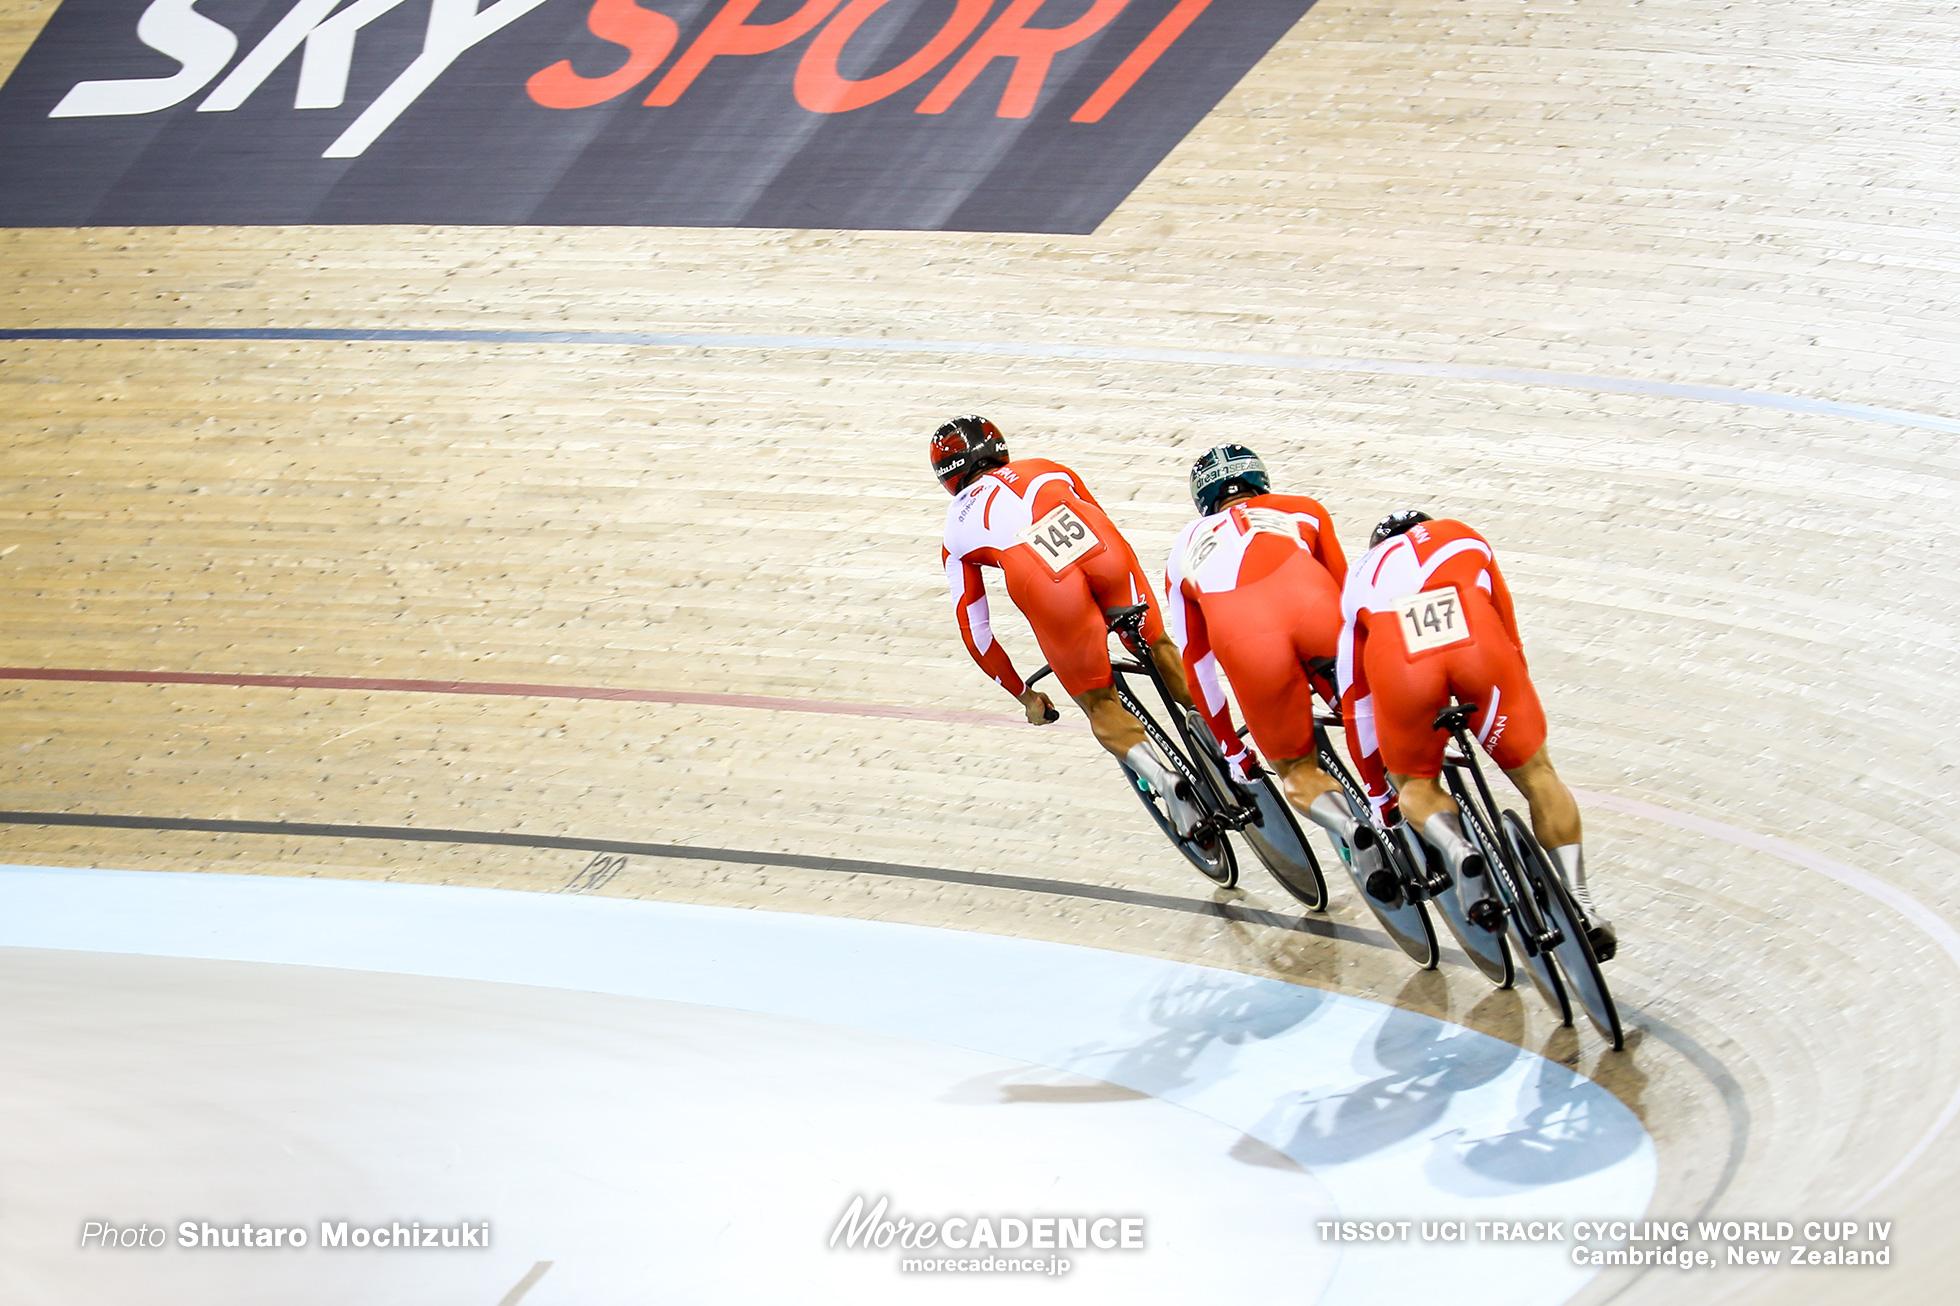 Qualifying / Men's Team Sprint / TISSOT UCI TRACK CYCLING WORLD CUP IV, Cambridge, New Zealand, 深谷知広 新田祐大 雨谷一樹